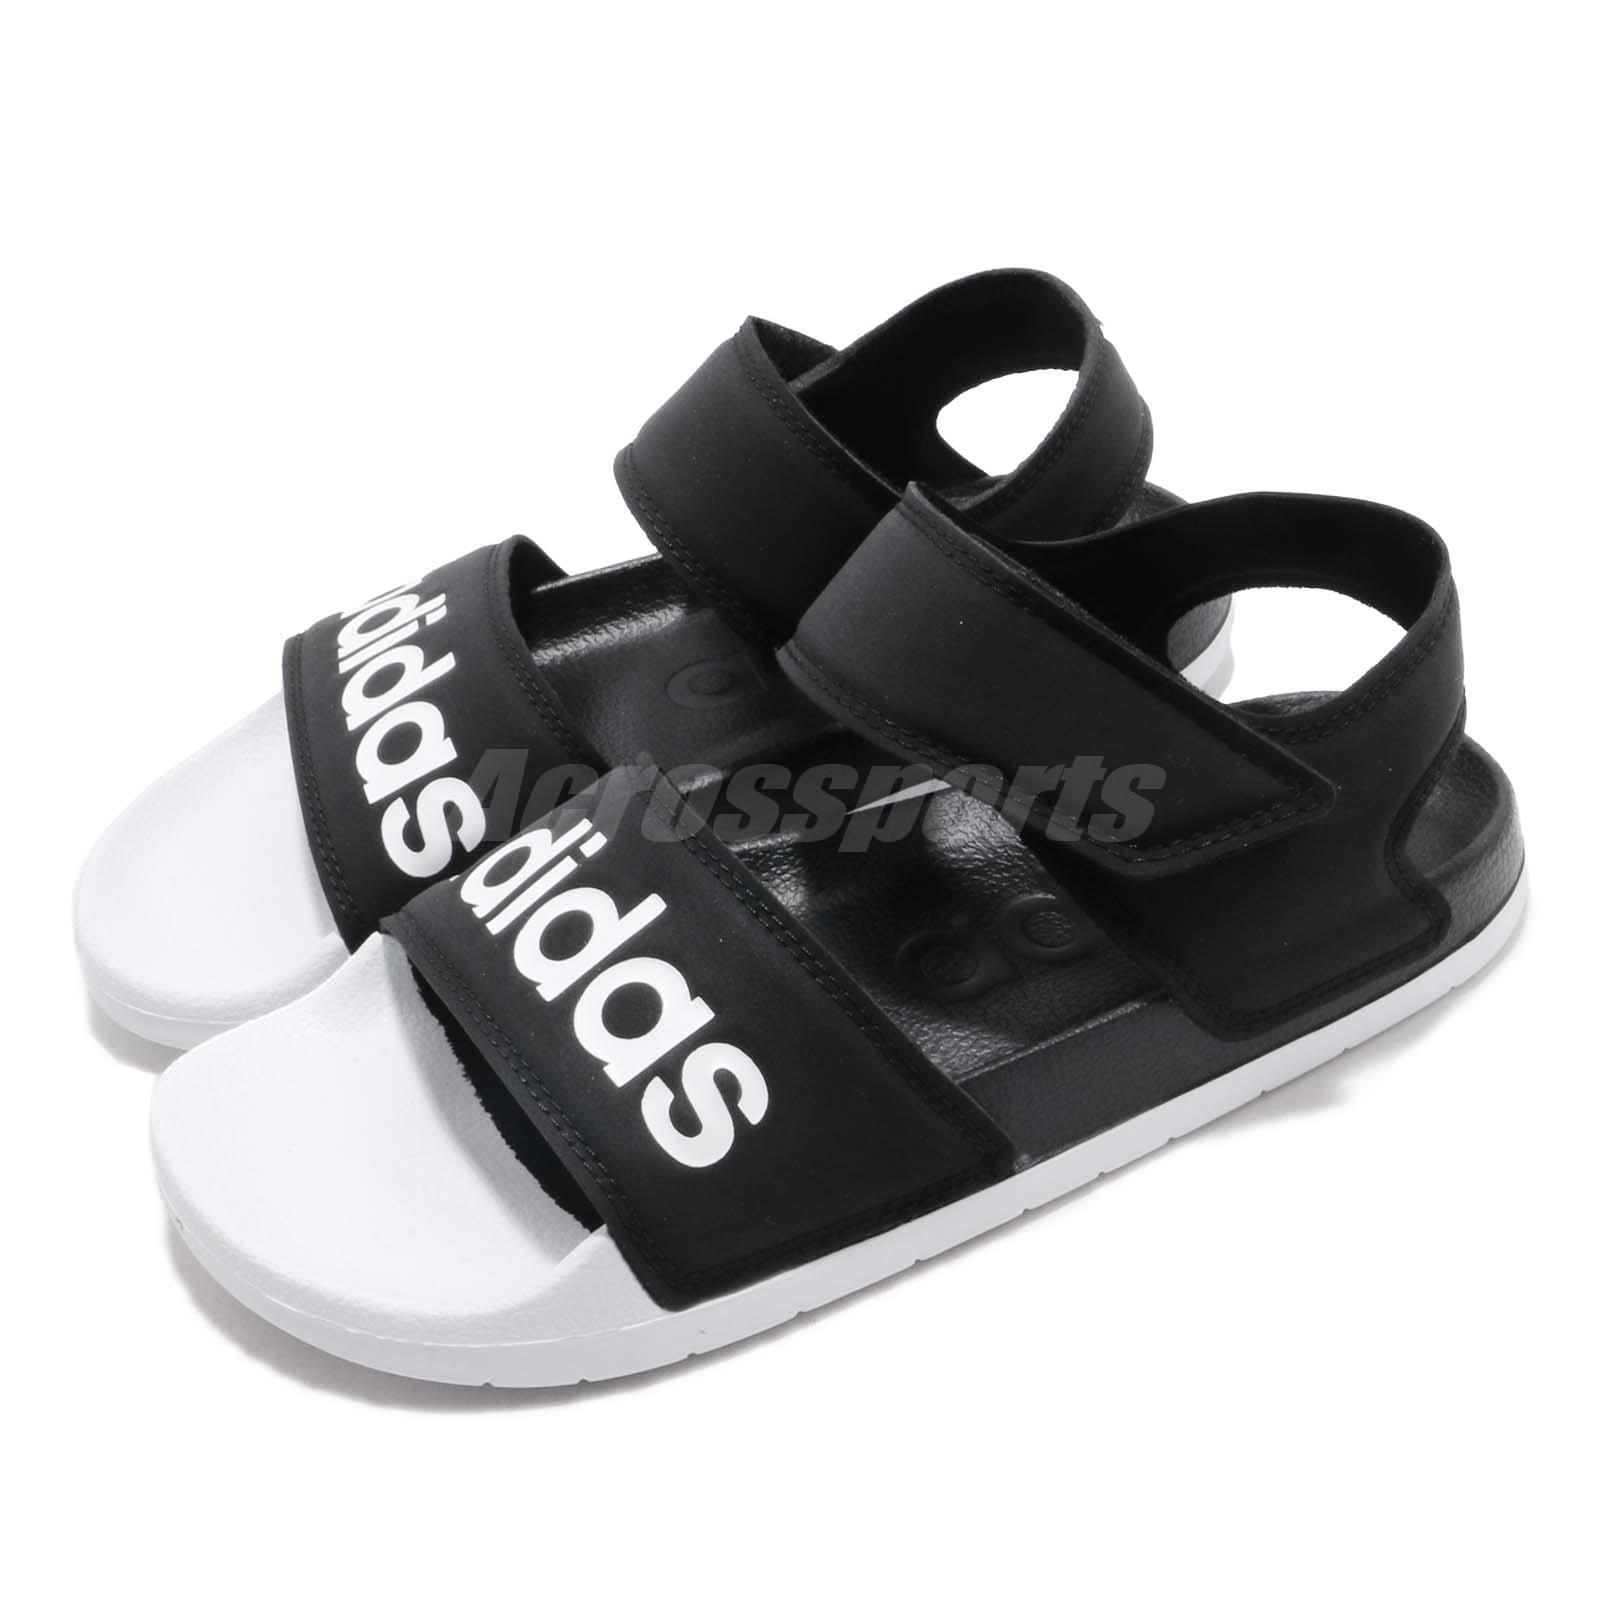 43c11b90d85c Details about adidas Adilette Sandal Black White Men Women Slip On Sports  Sandals F35416